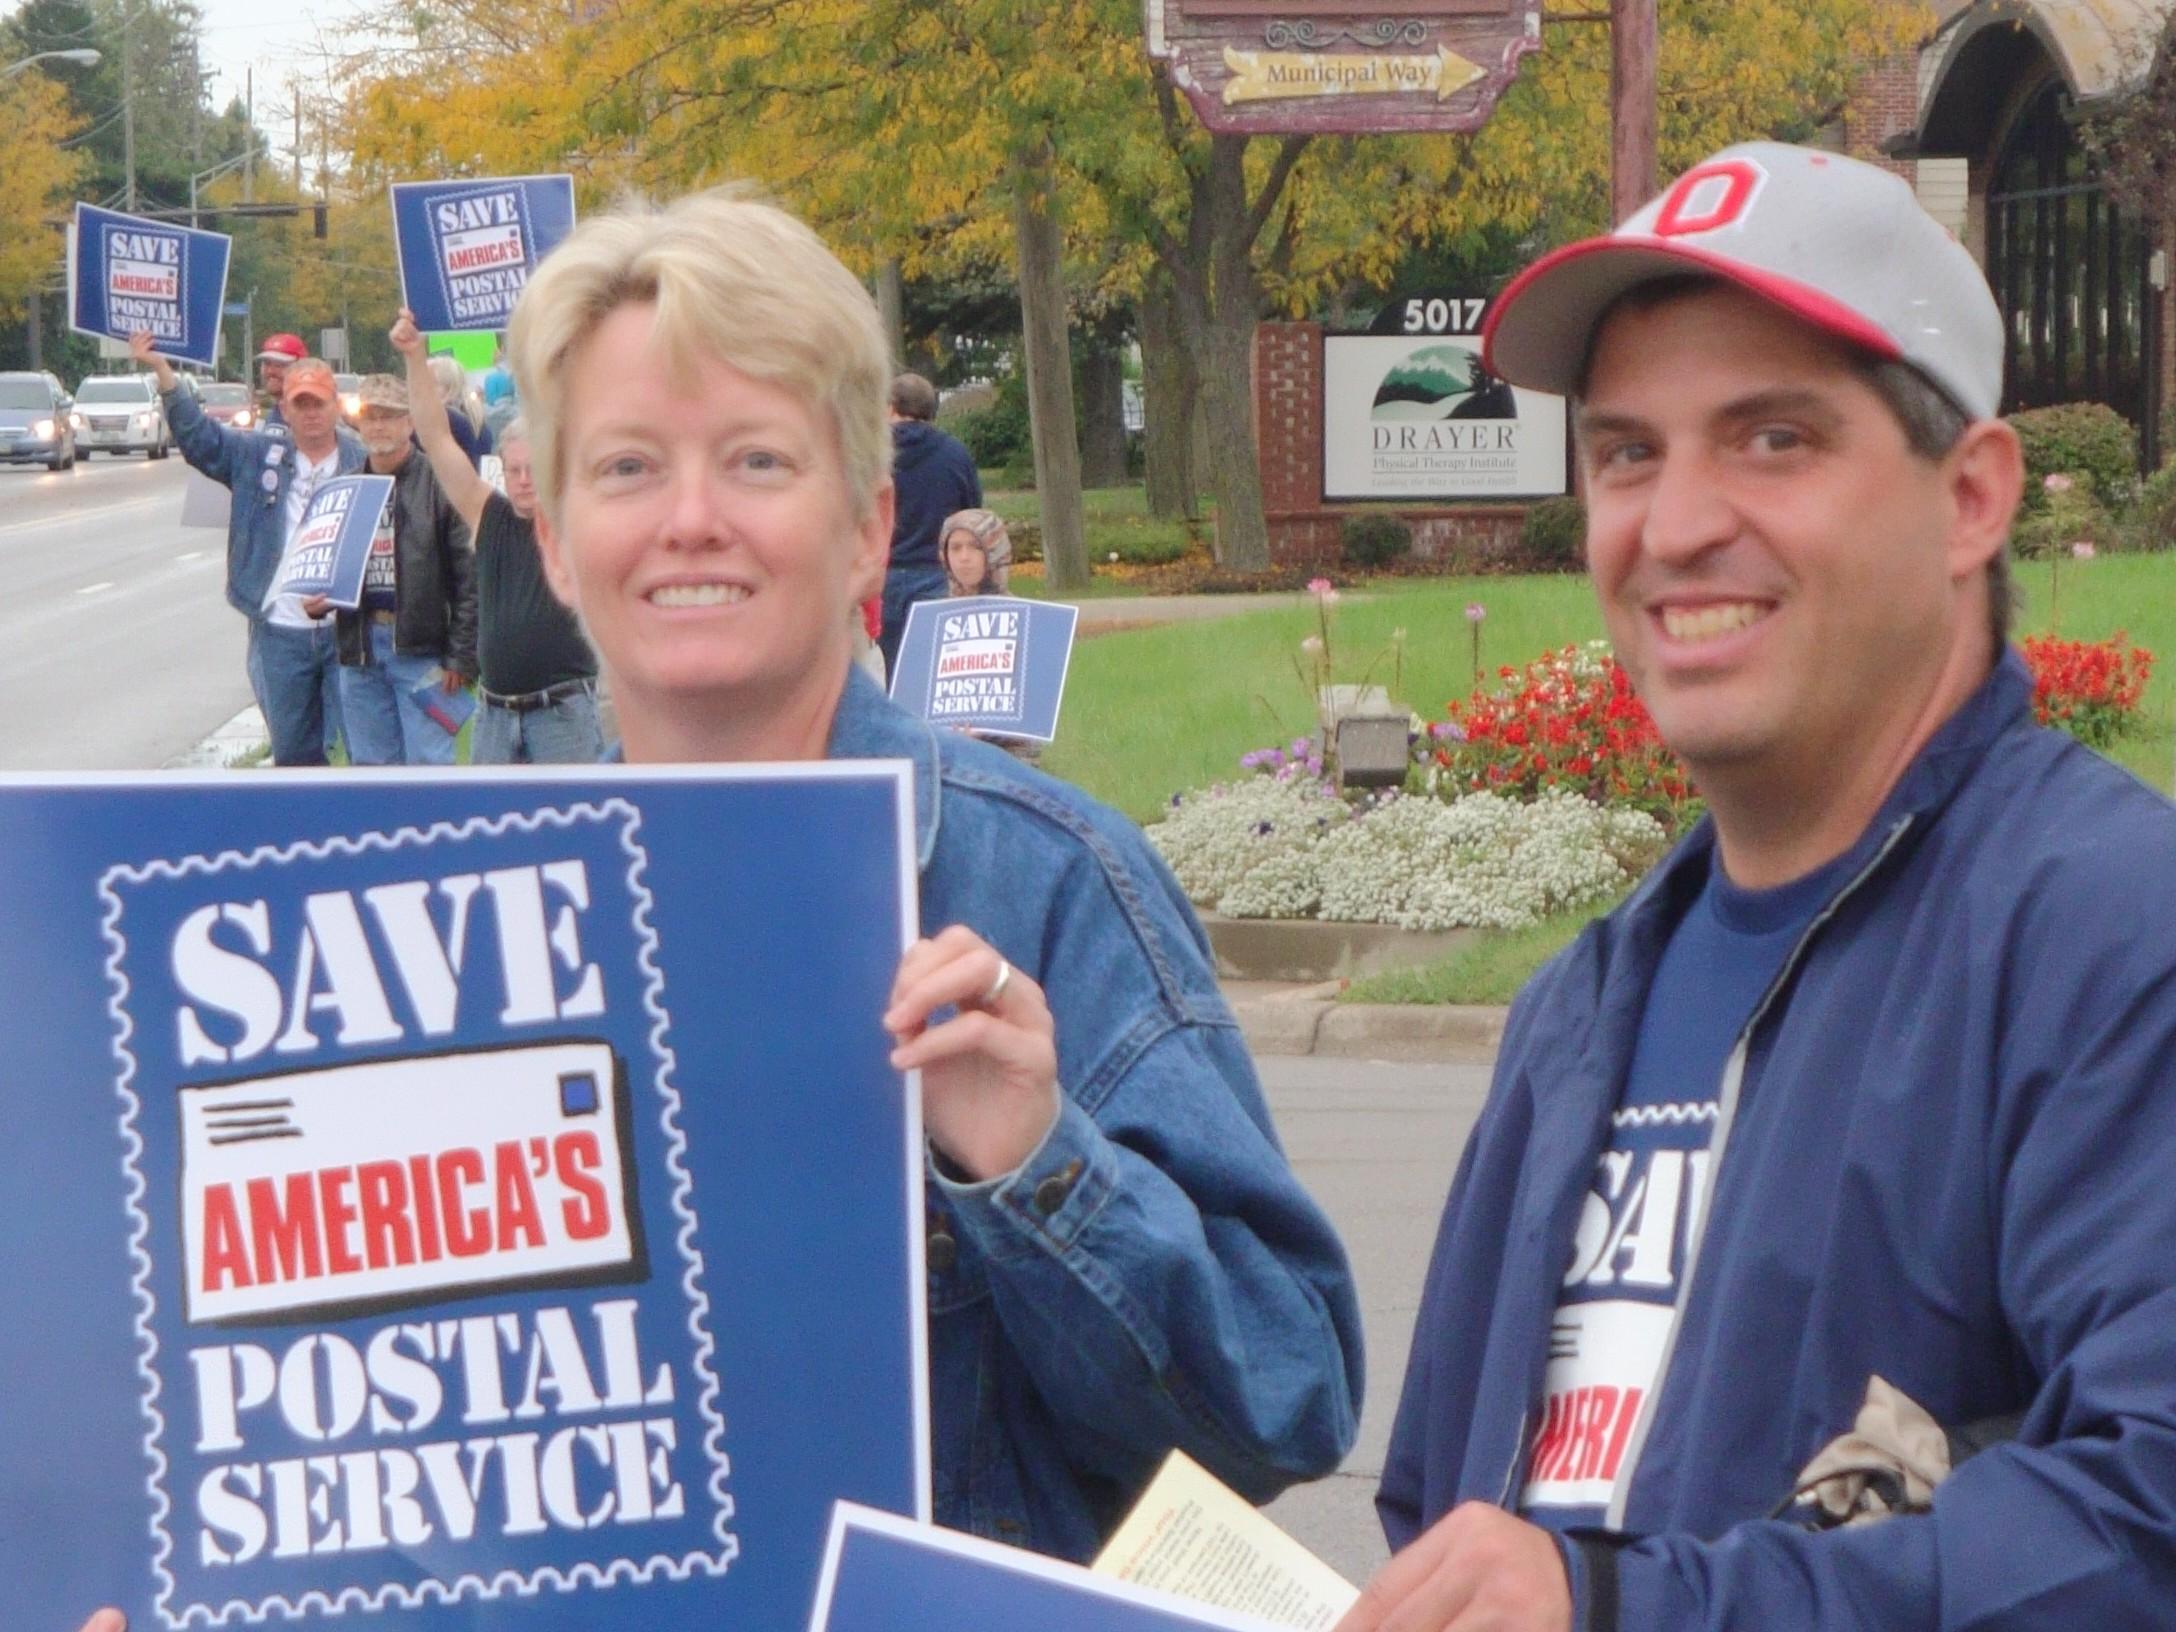 save-postal-service-rally-9-27-11-054_6301681319_o.jpg